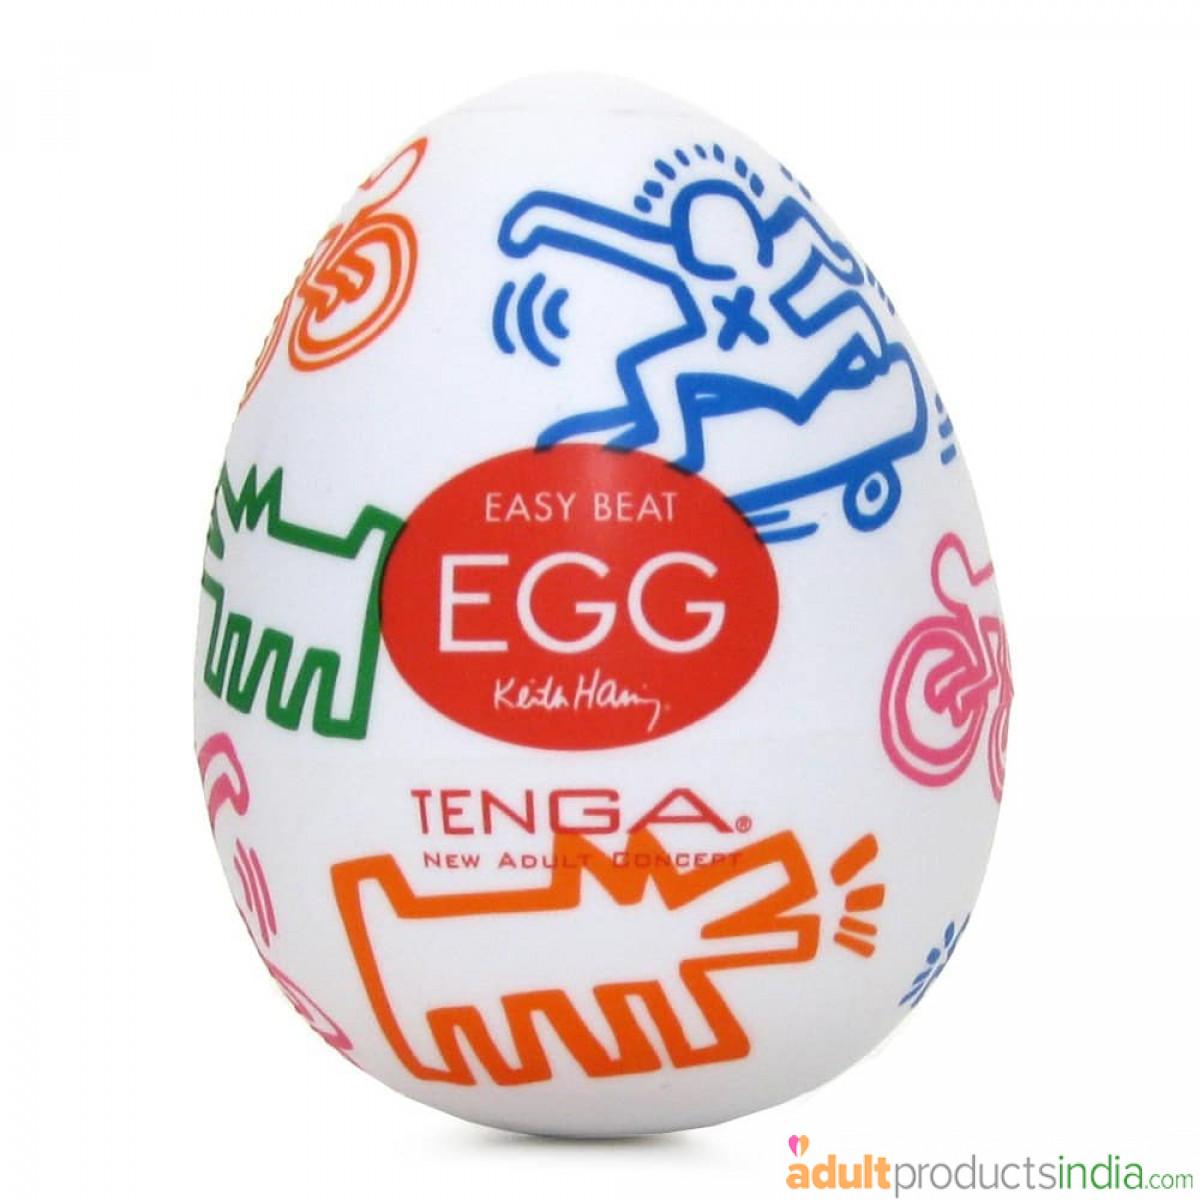 Tenga Keith Haring Egg Masturbator Feel the Rush